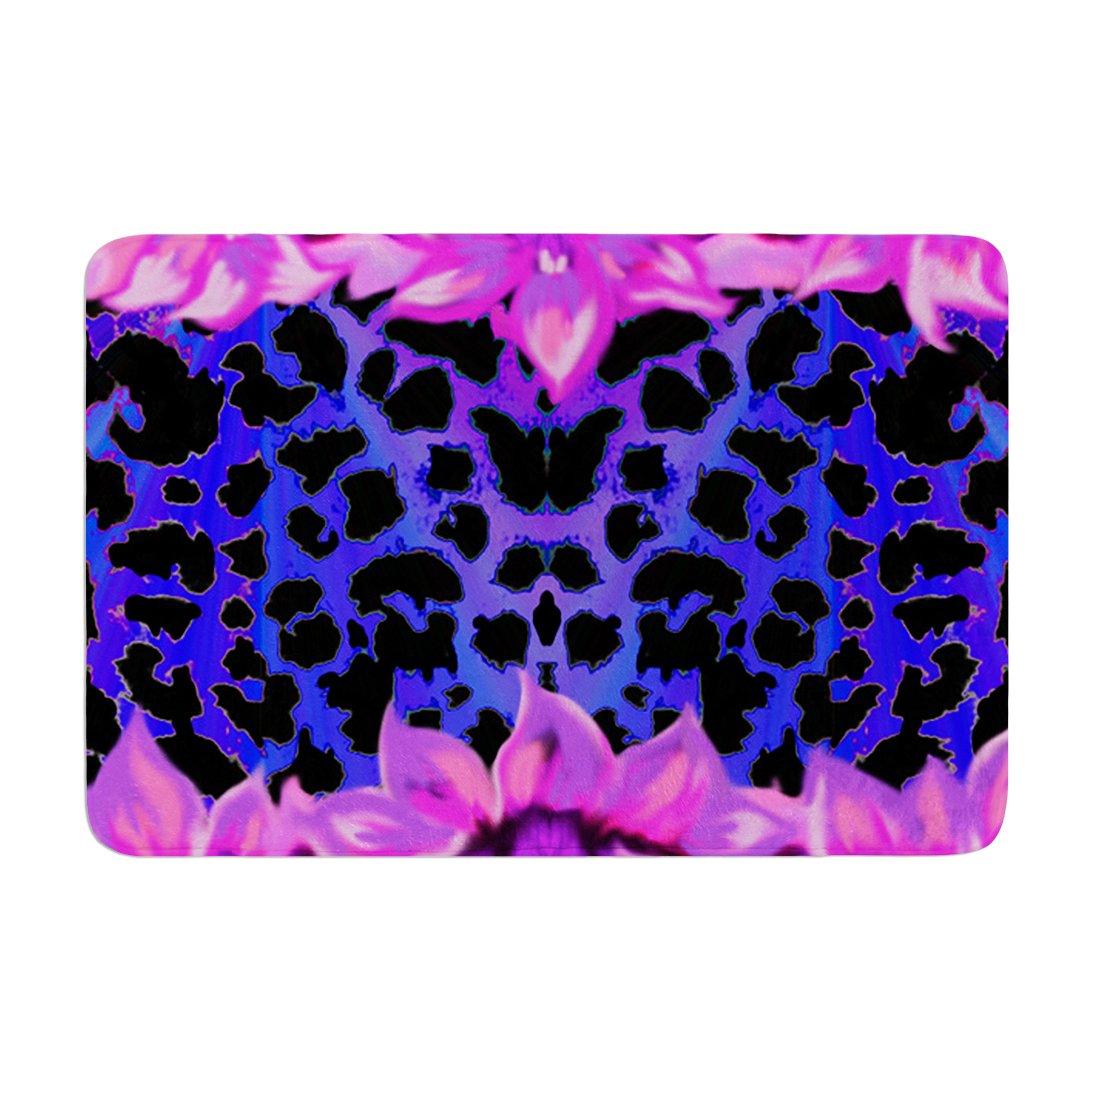 17 by 24 Kess InHouse Nina May Cerruda Leora Purple Pink Memory Foam Bath Mat